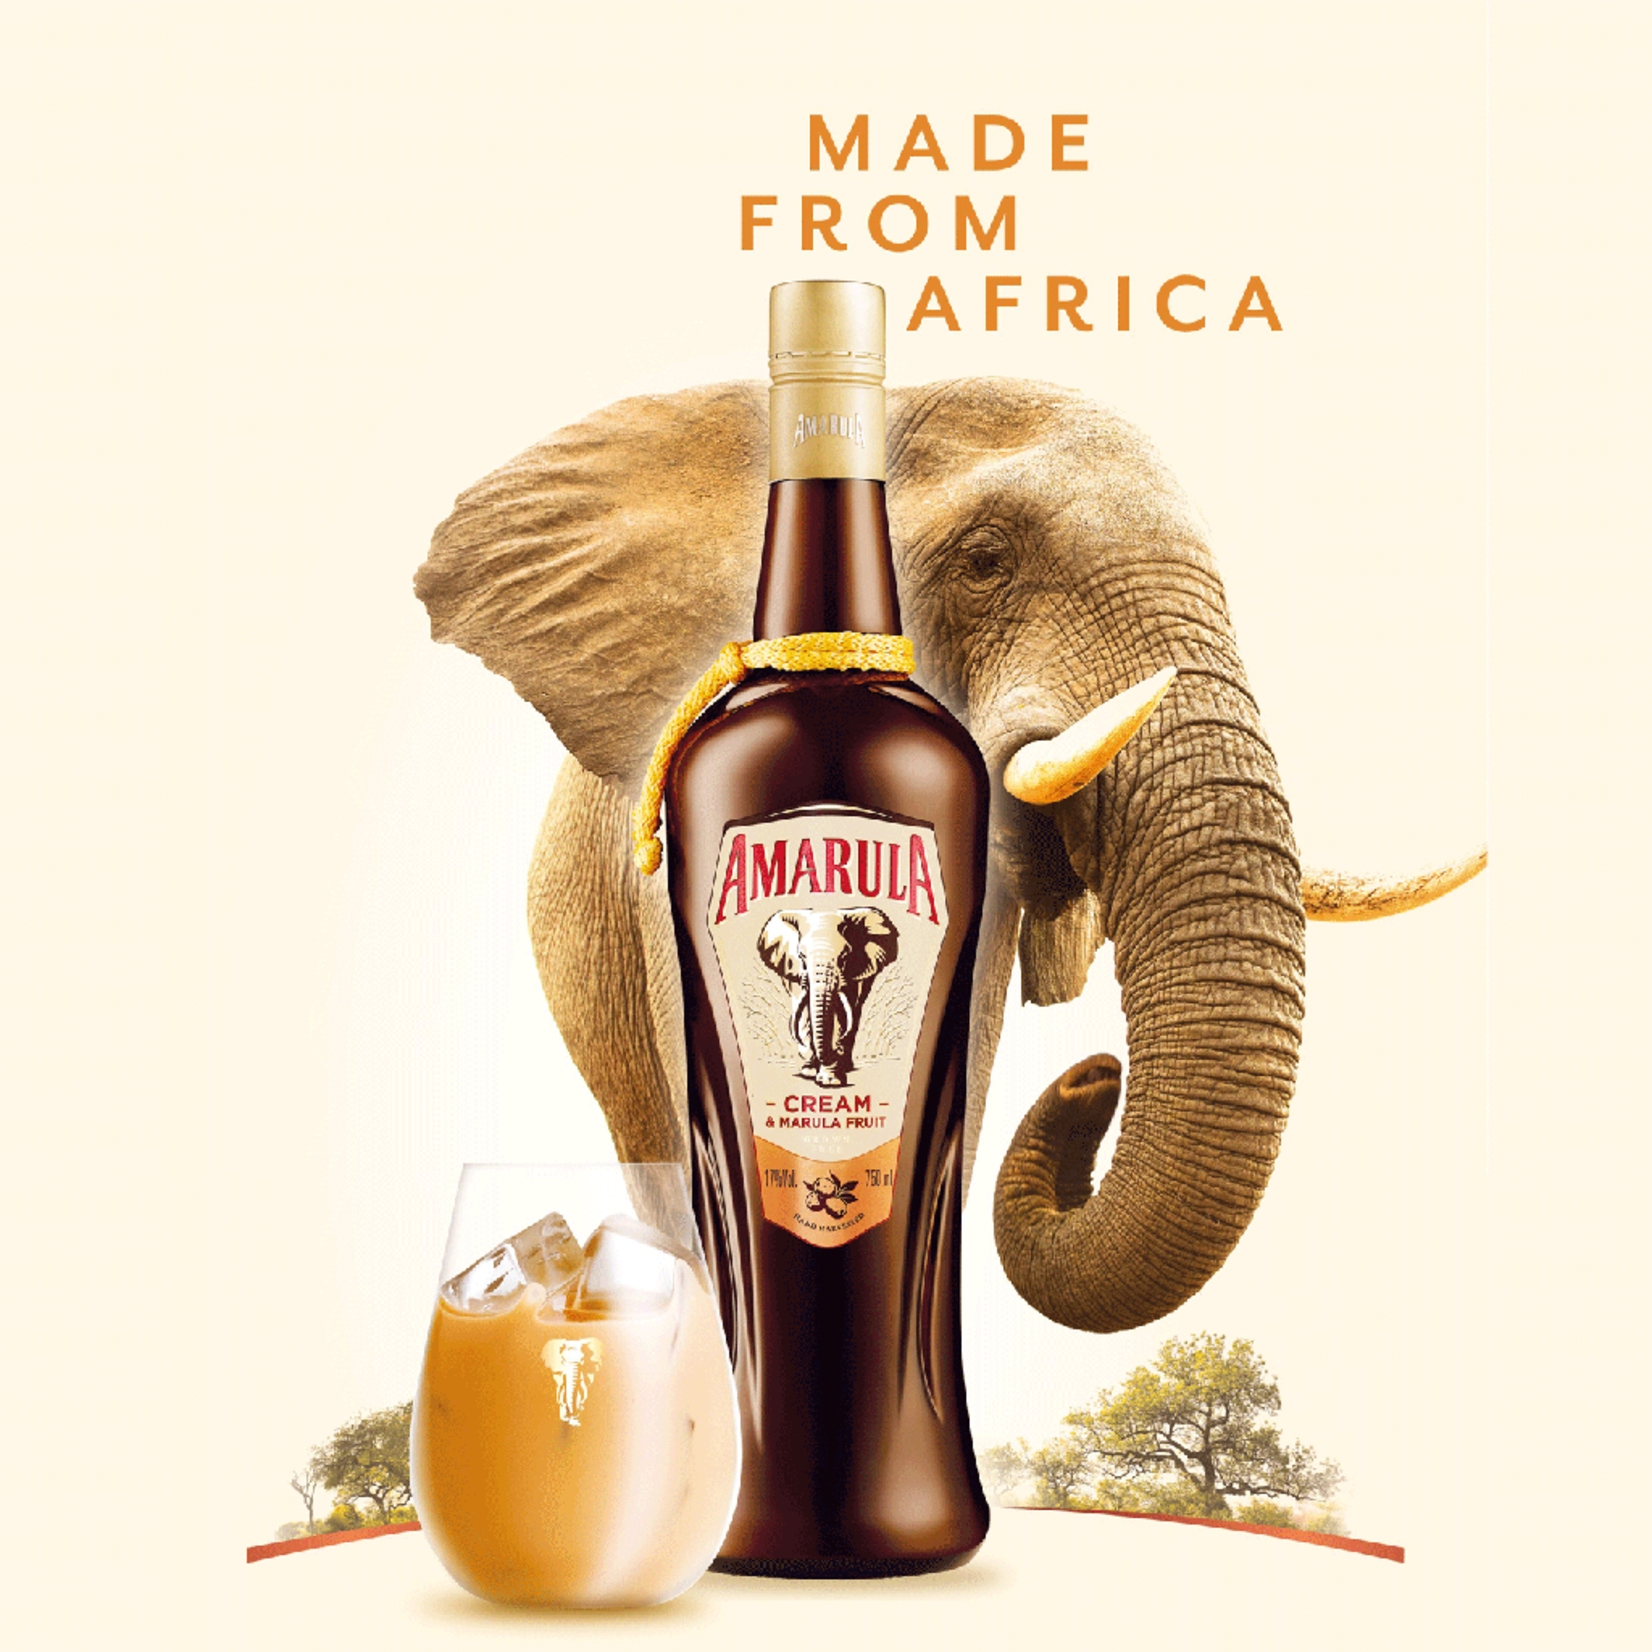 Amarula Cream Liquor